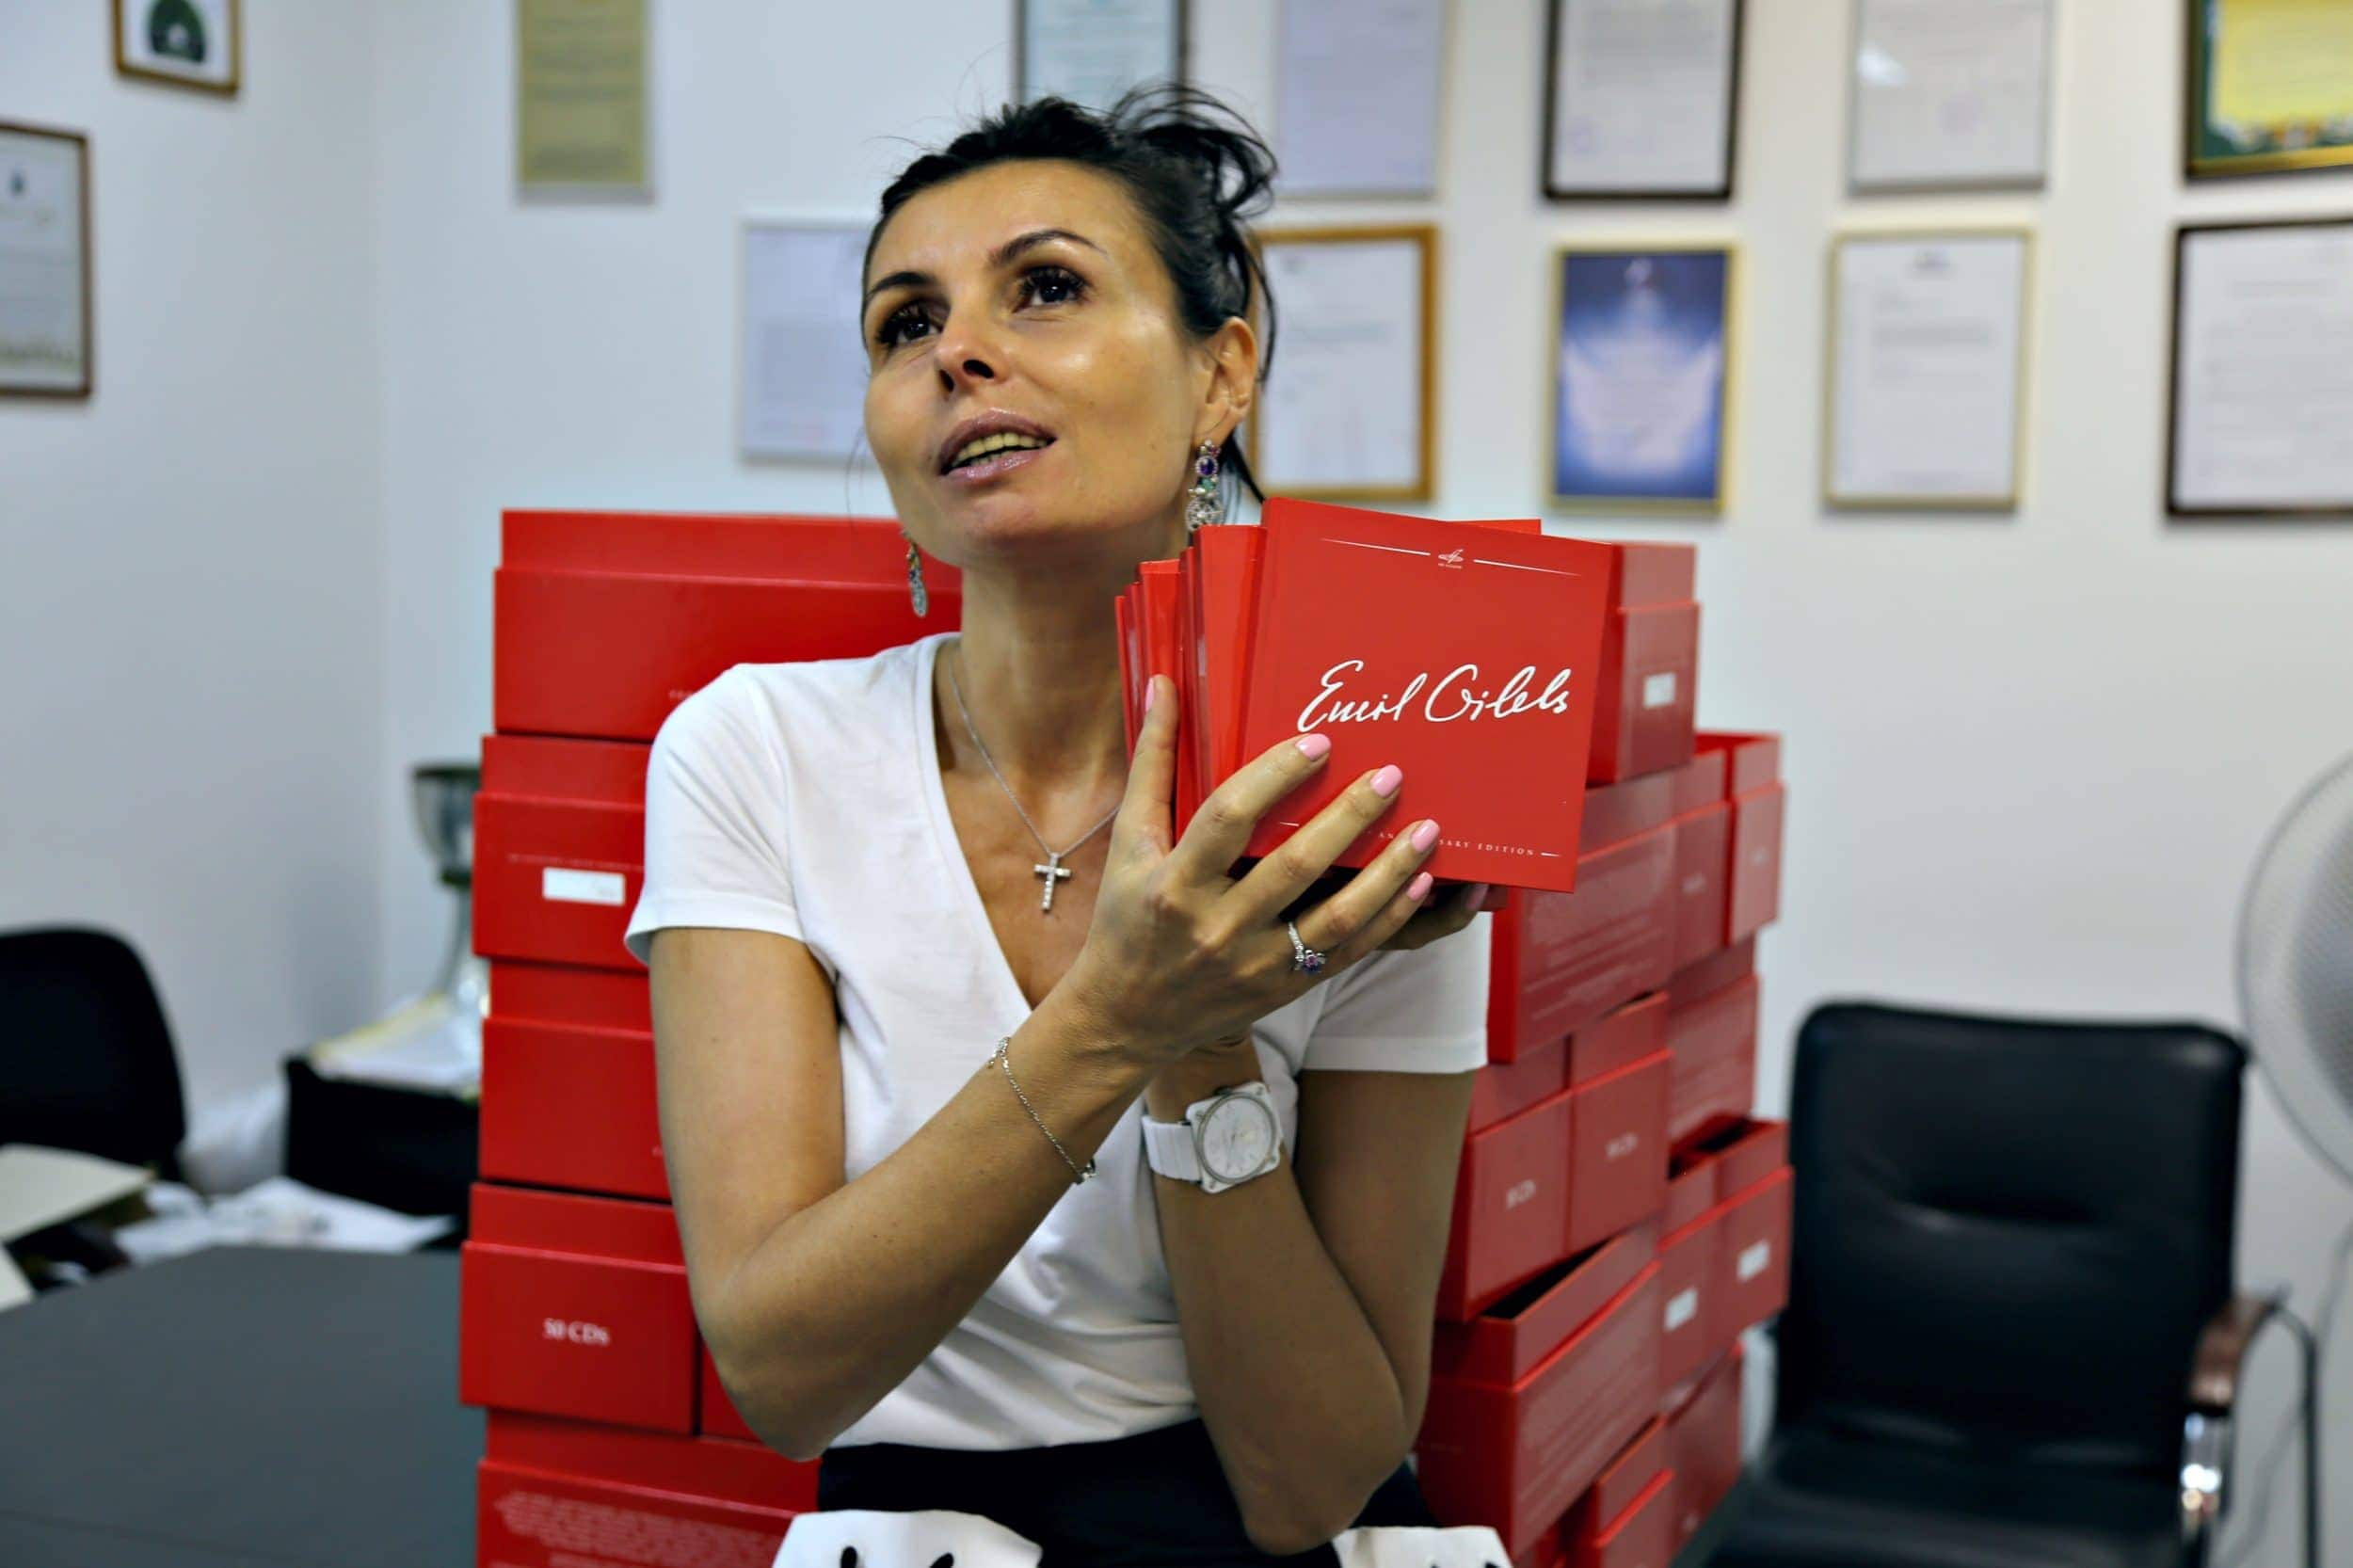 Карина Абрамян. Фото - Ирина Шымчак